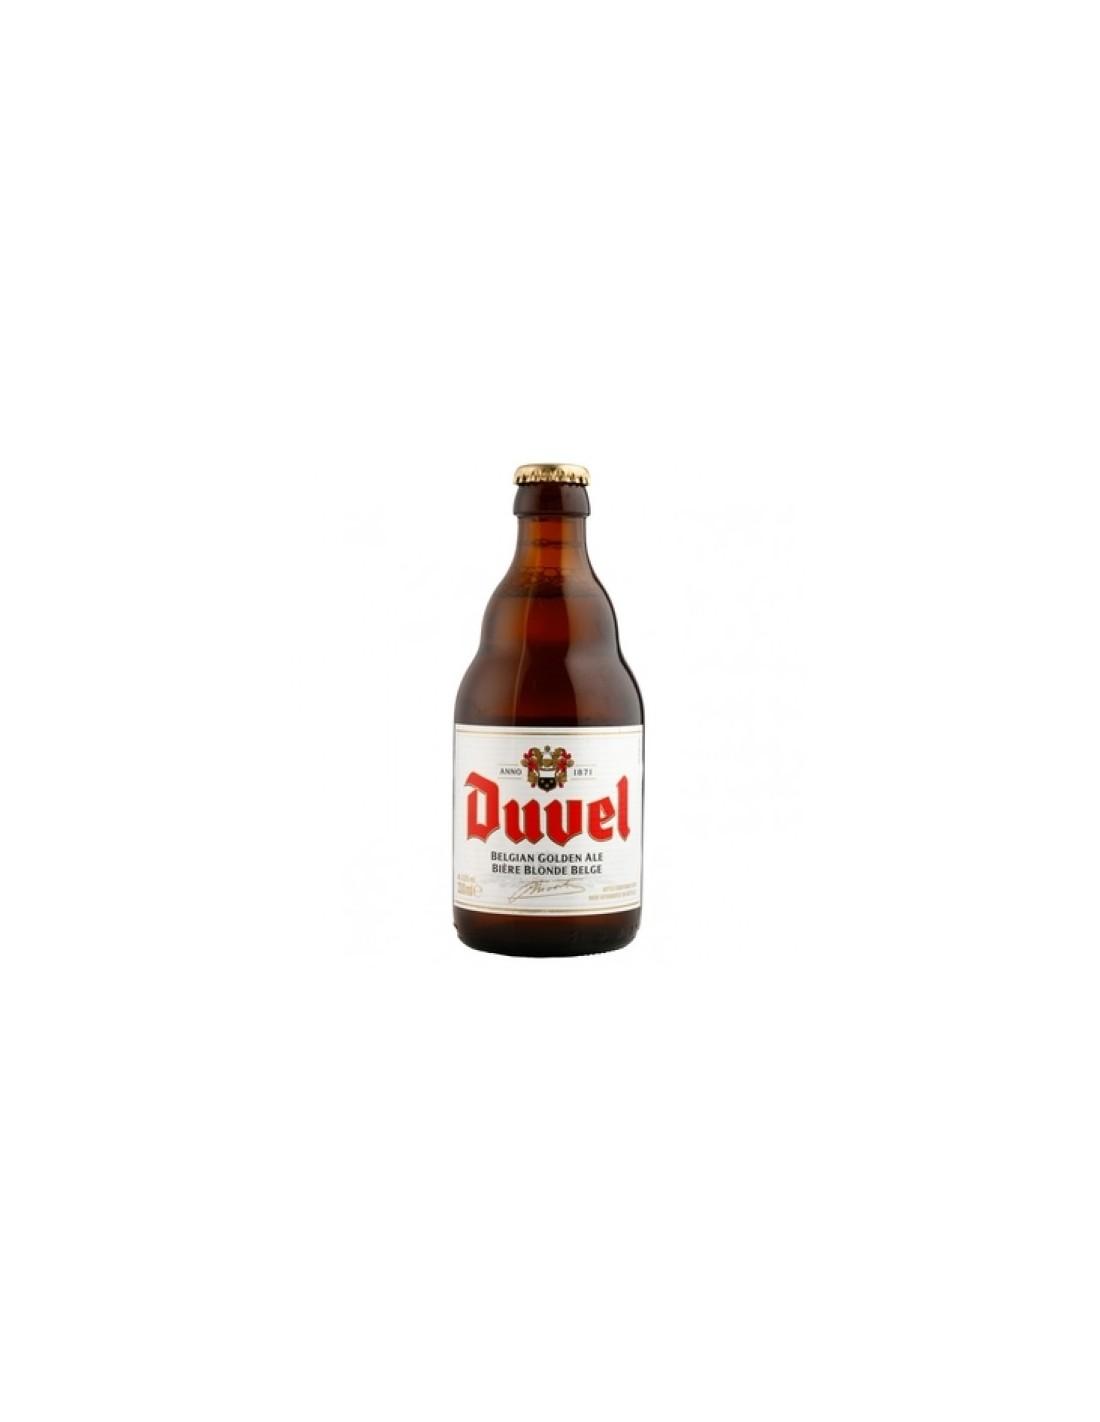 Bere blonda, filtrata DuveL, 8.5% alc., 0.33L, Belgia